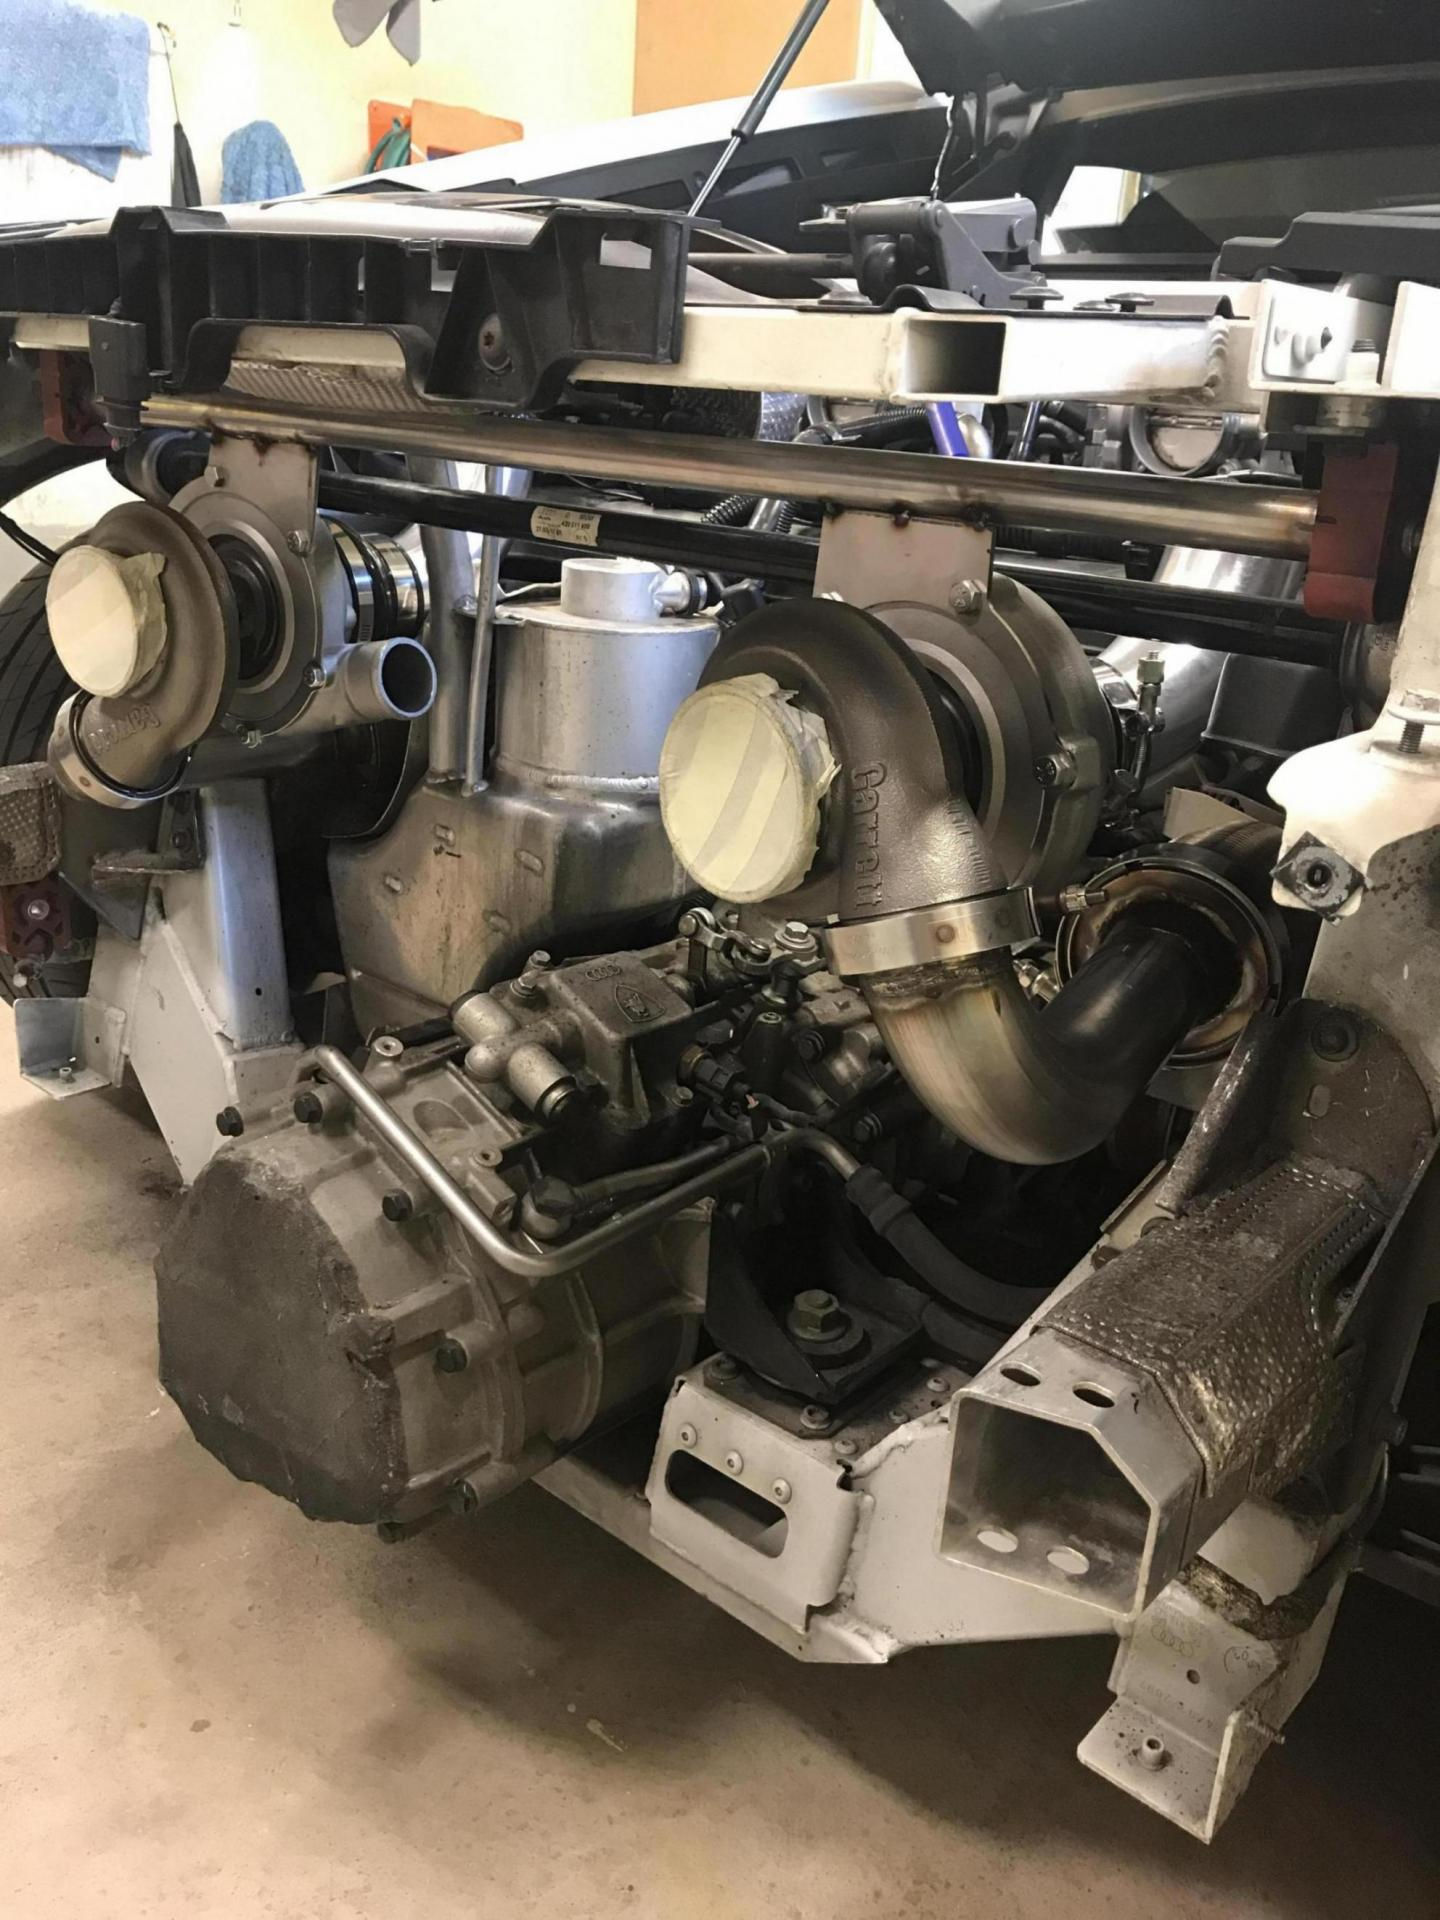 R8 v8 turbo project-image_1540116447133.jpg